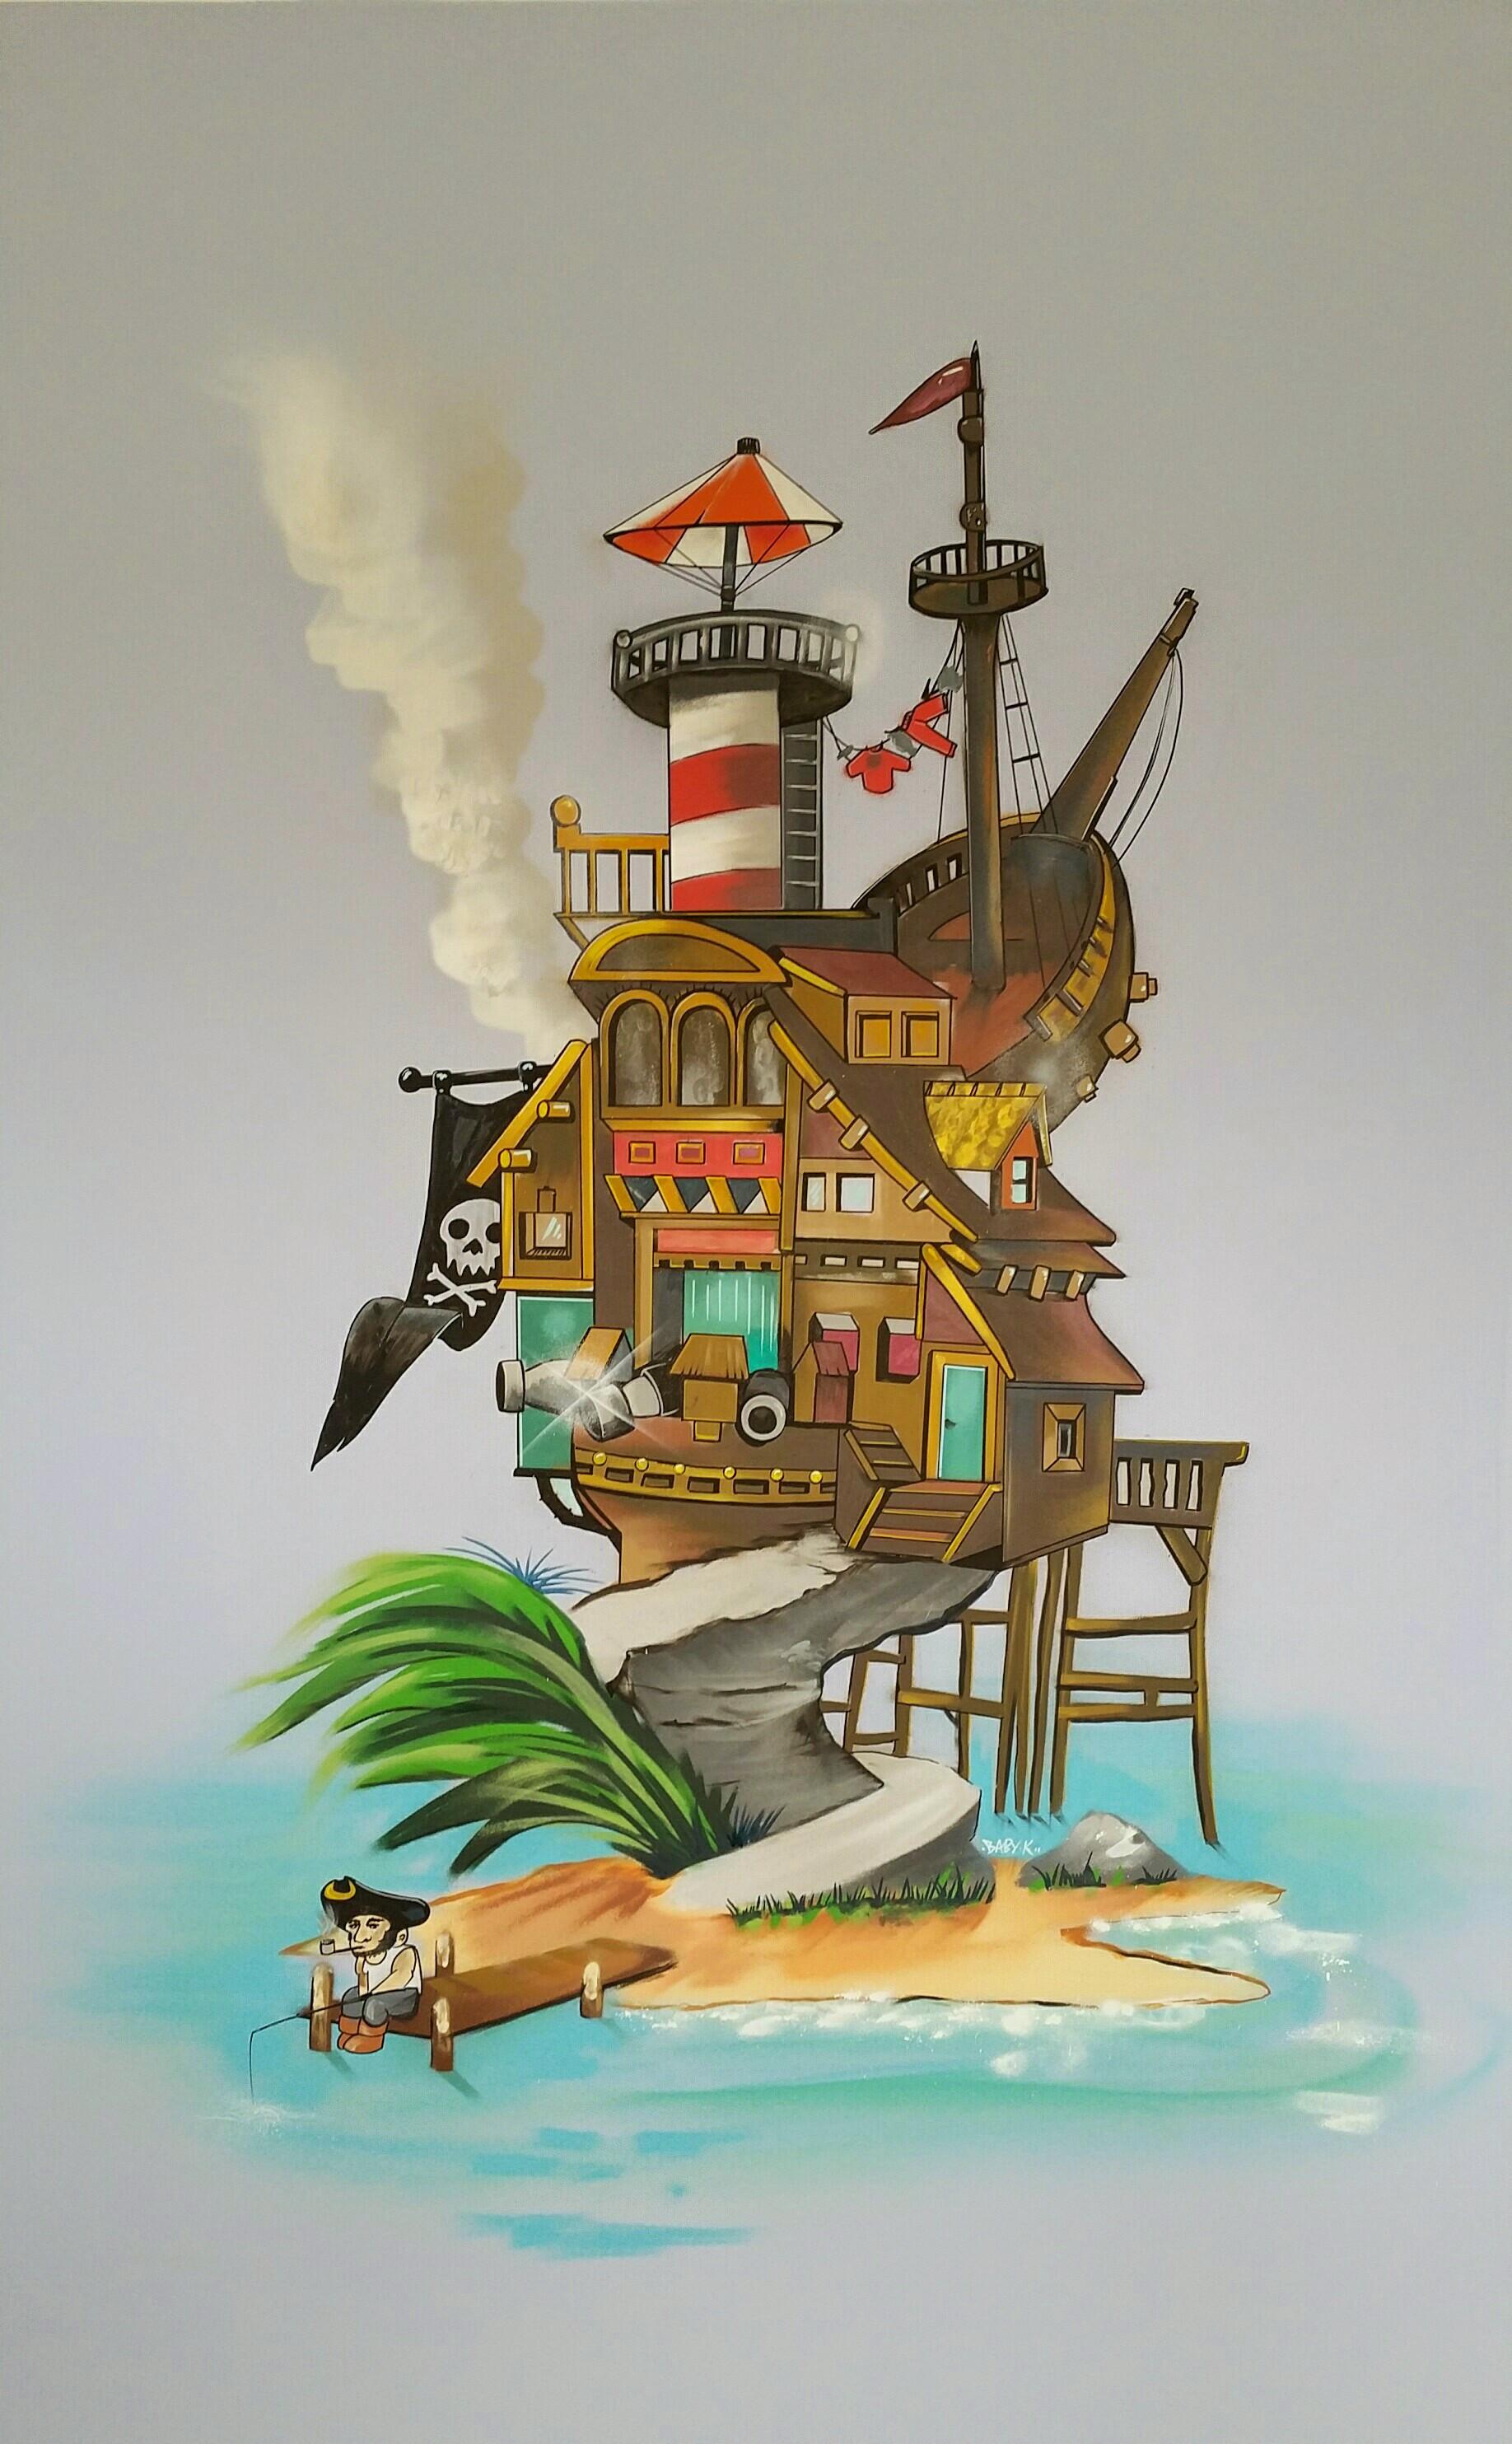 Graff thème pirates chambre d'enfant